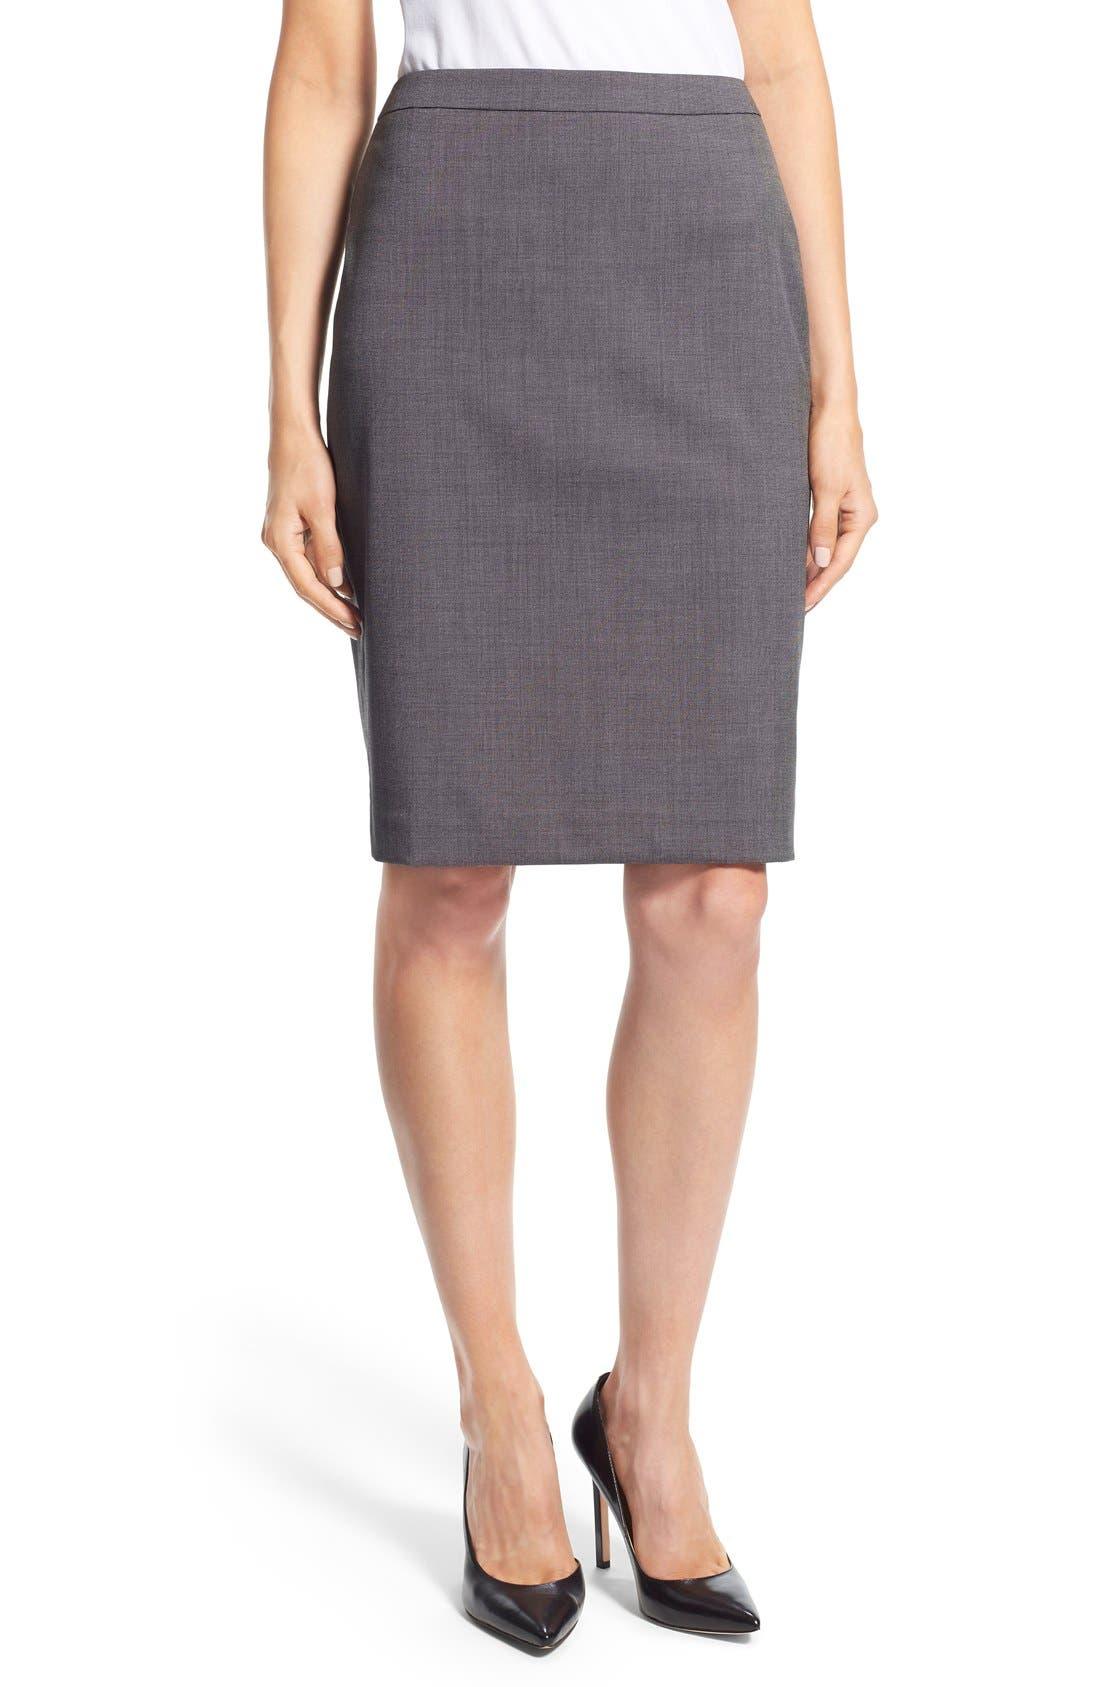 Alternate Image 1 Selected - Halogen® 'Mini Grid' Stretch Suit Skirt (Regular & Petite)